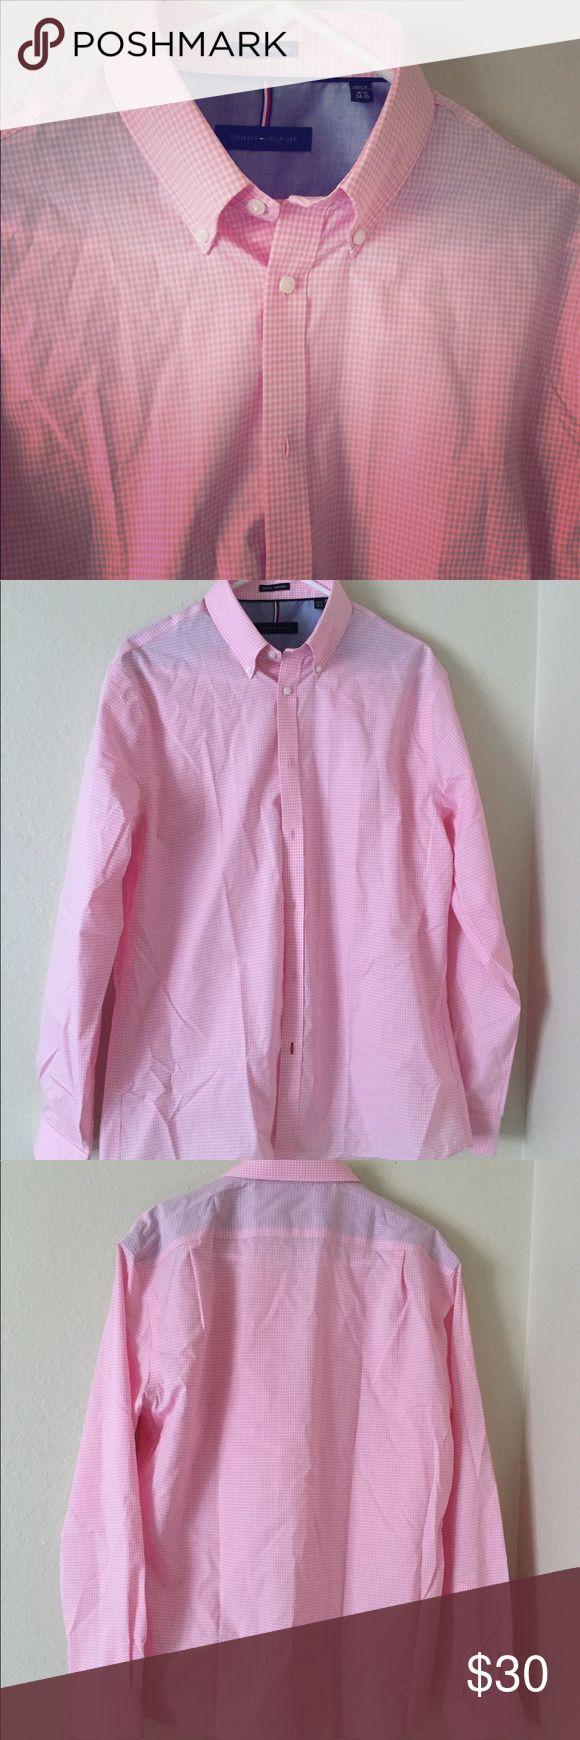 NWOT Tommy Hilfiger Slim Fit Dress Shirt NWOT. Perfect condition. 16.5, 34-35. ✅Bundle & save! Tommy Hilfiger Shirts Dress Shirts